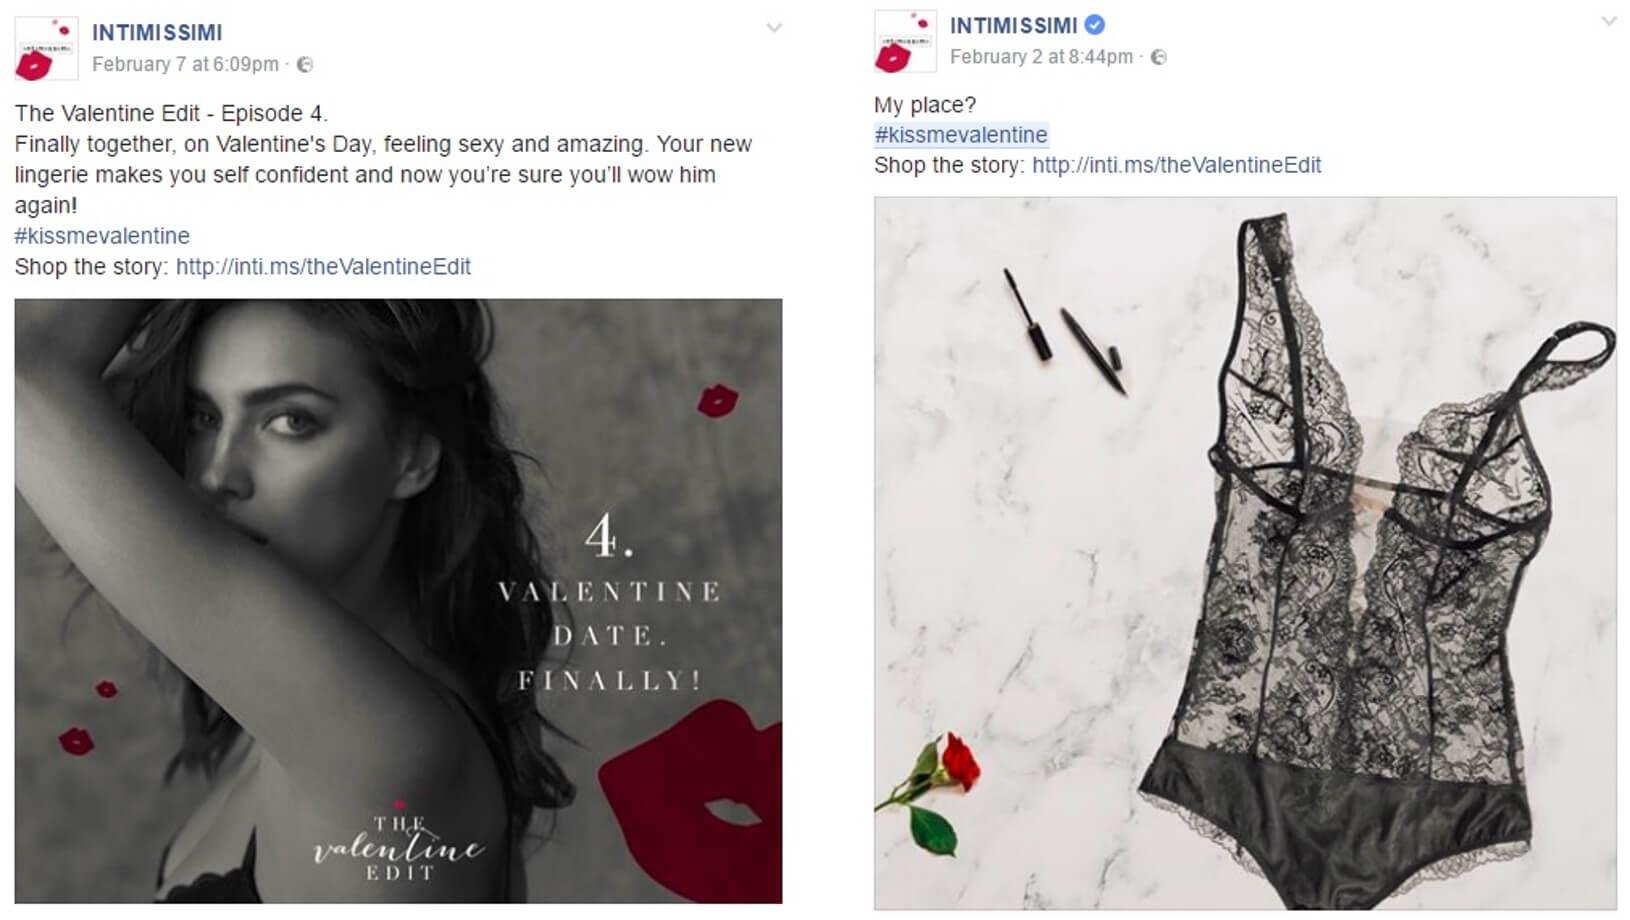 Intimissimi na Facebooku - posty walentynkowe